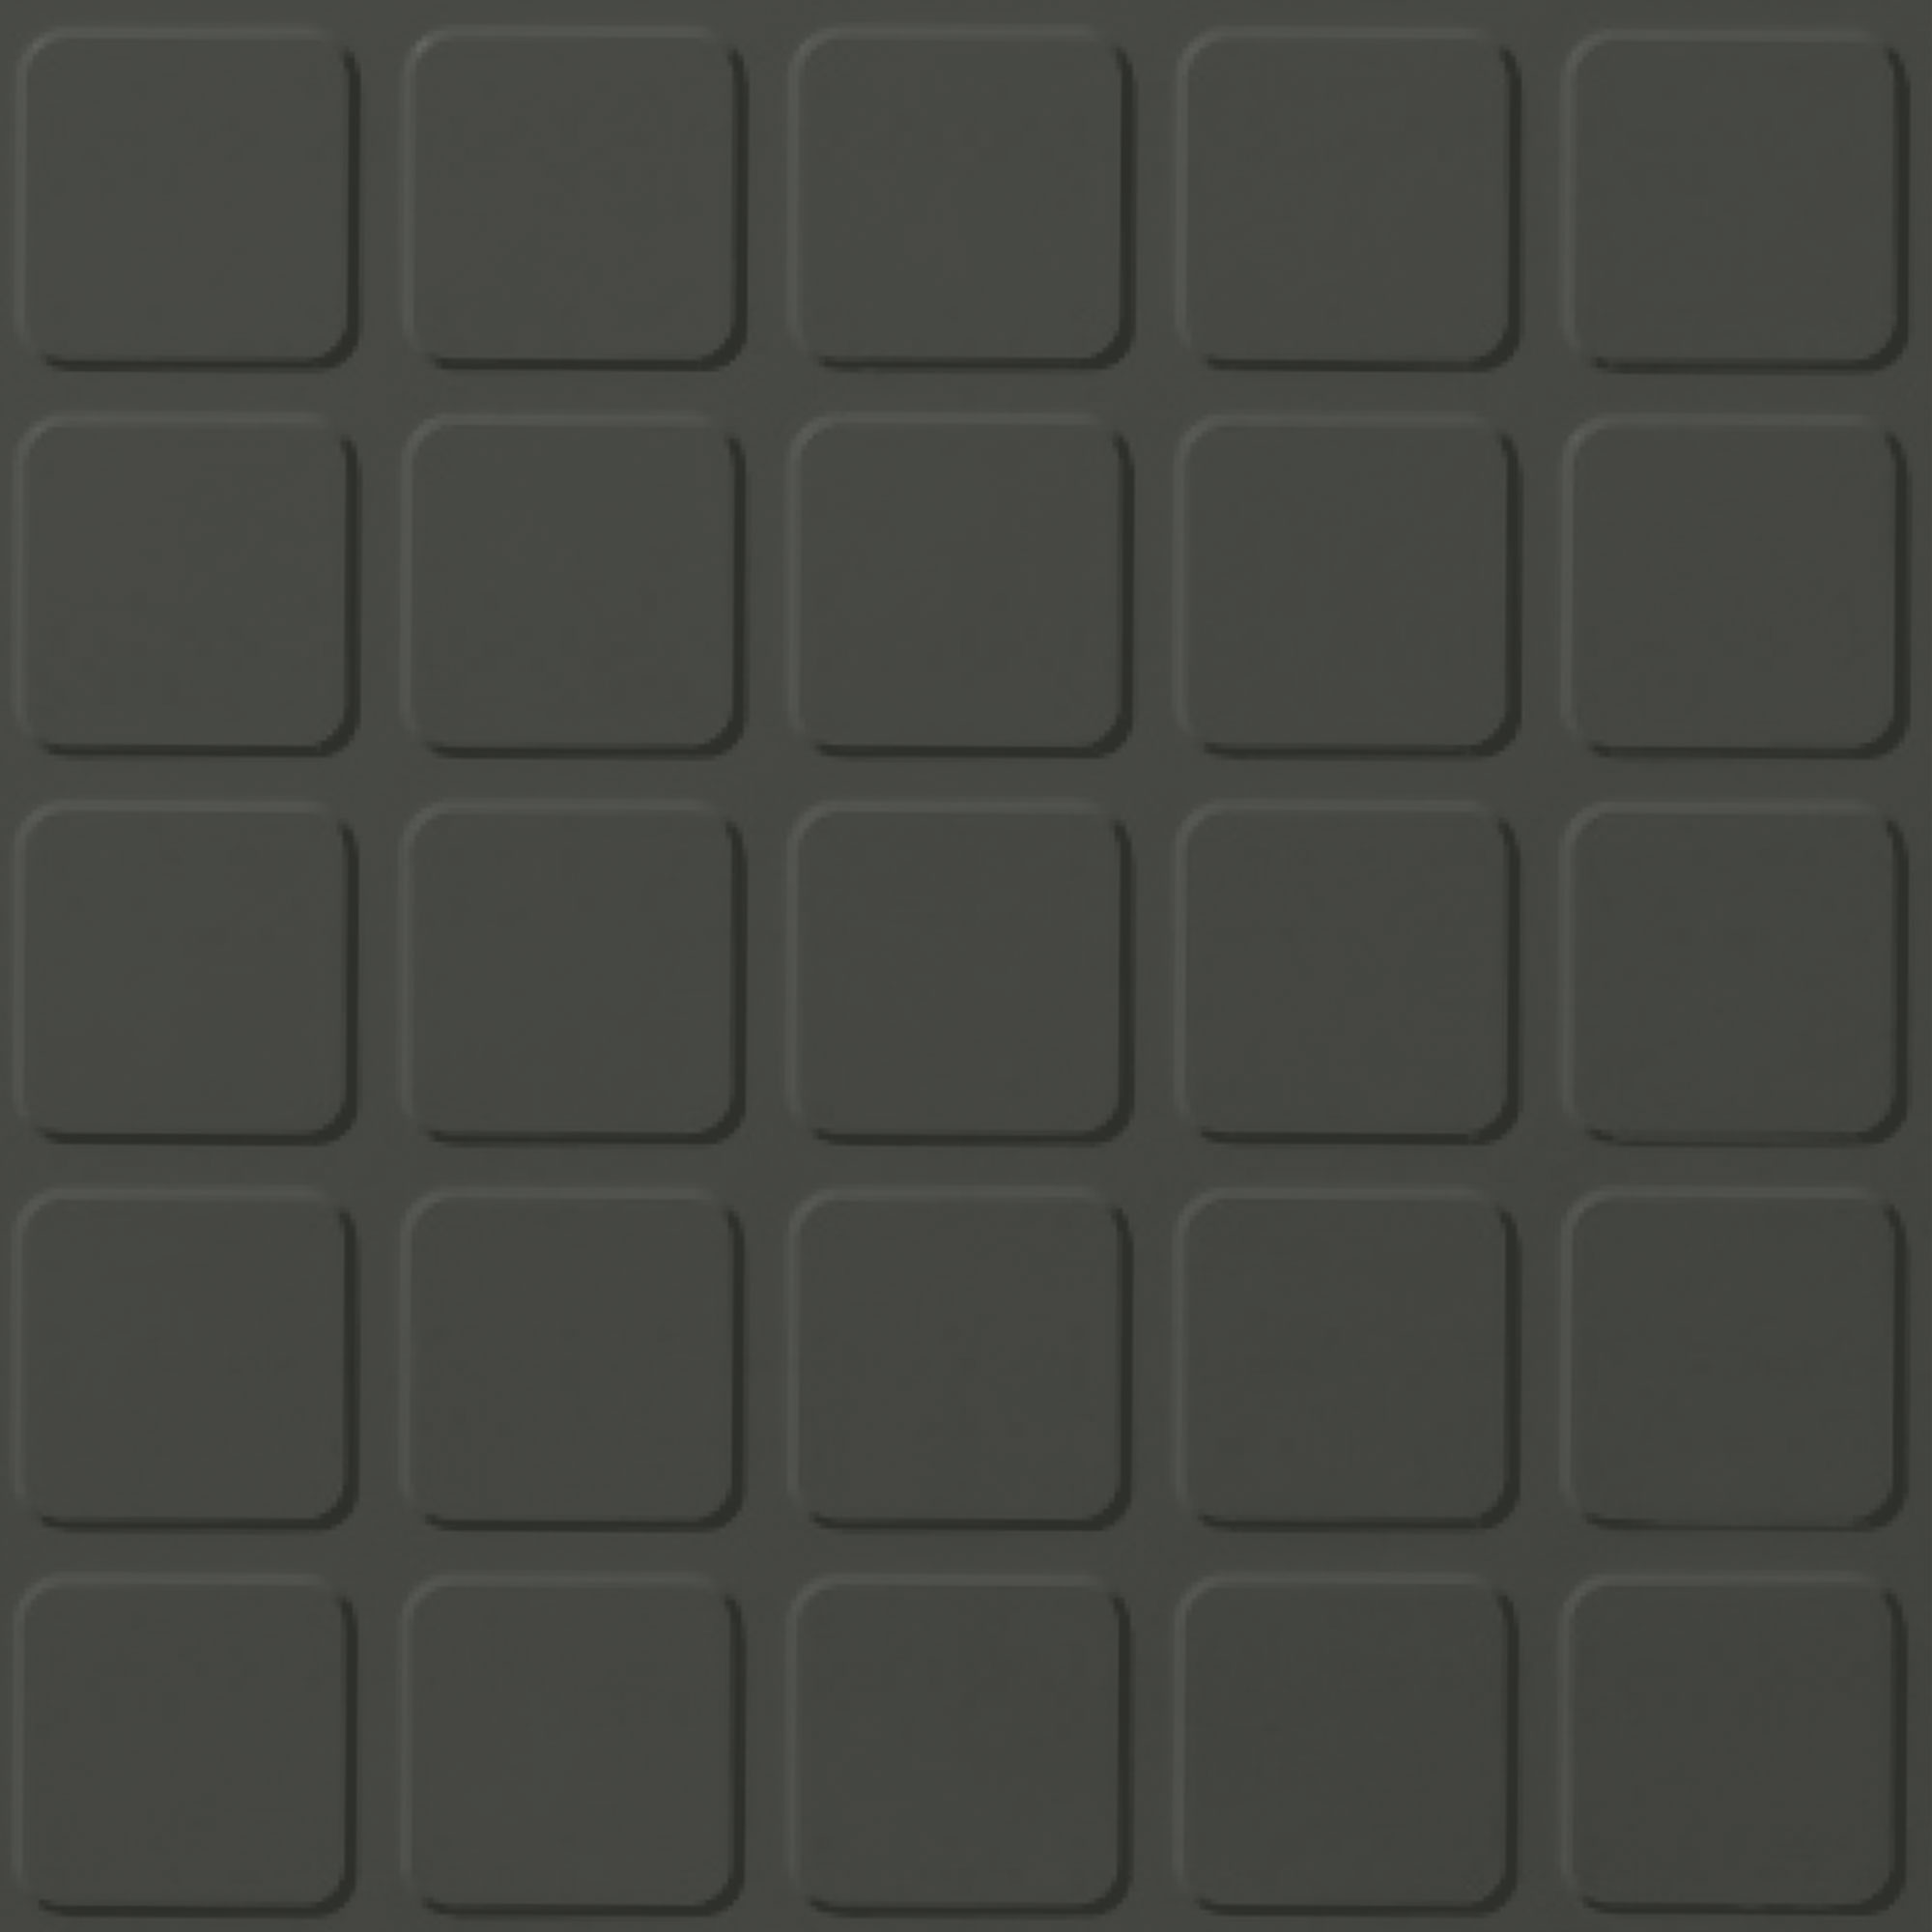 Roppe Rubber Tile 900 - Raised Square Design (994) Black Brown Rubber Flooring